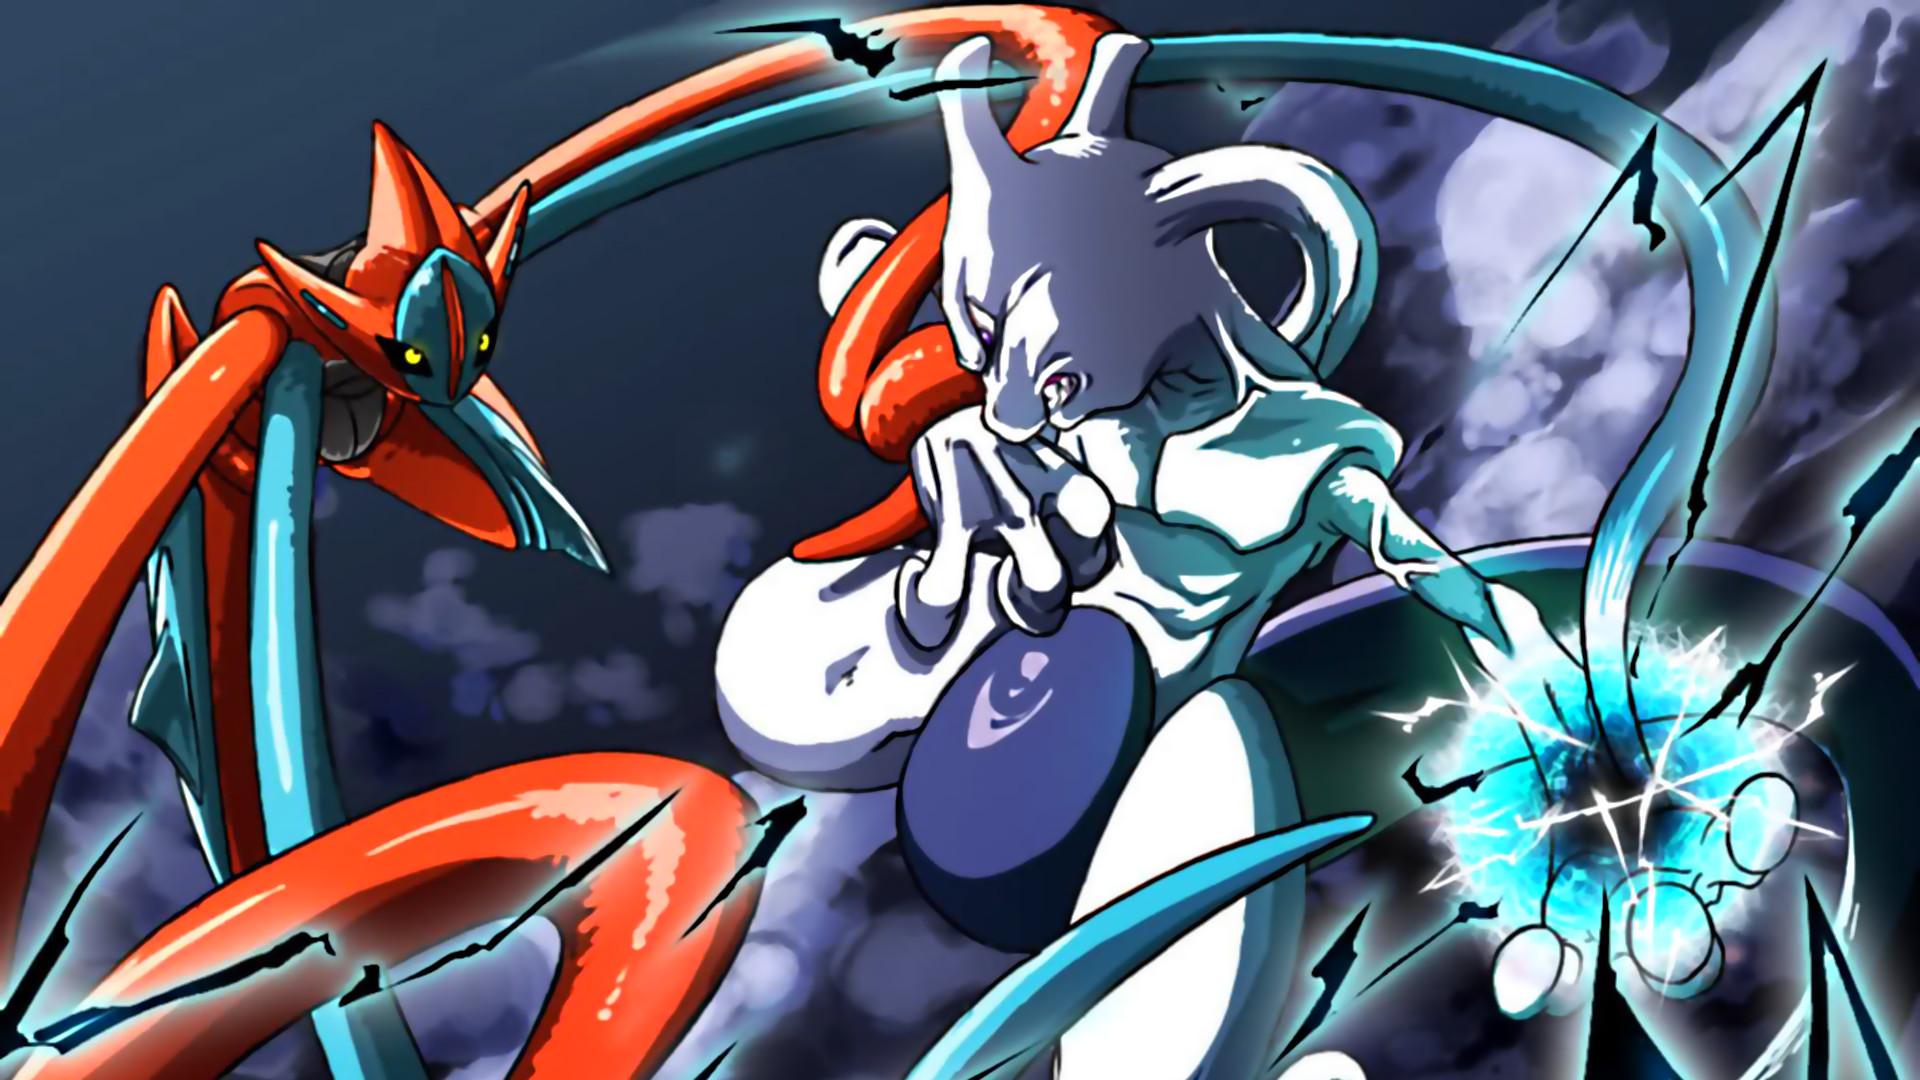 Pokemon Deoxys Vs Mewtwo HD Wallpaper by tommospidey.deviantart.com on  @deviantART